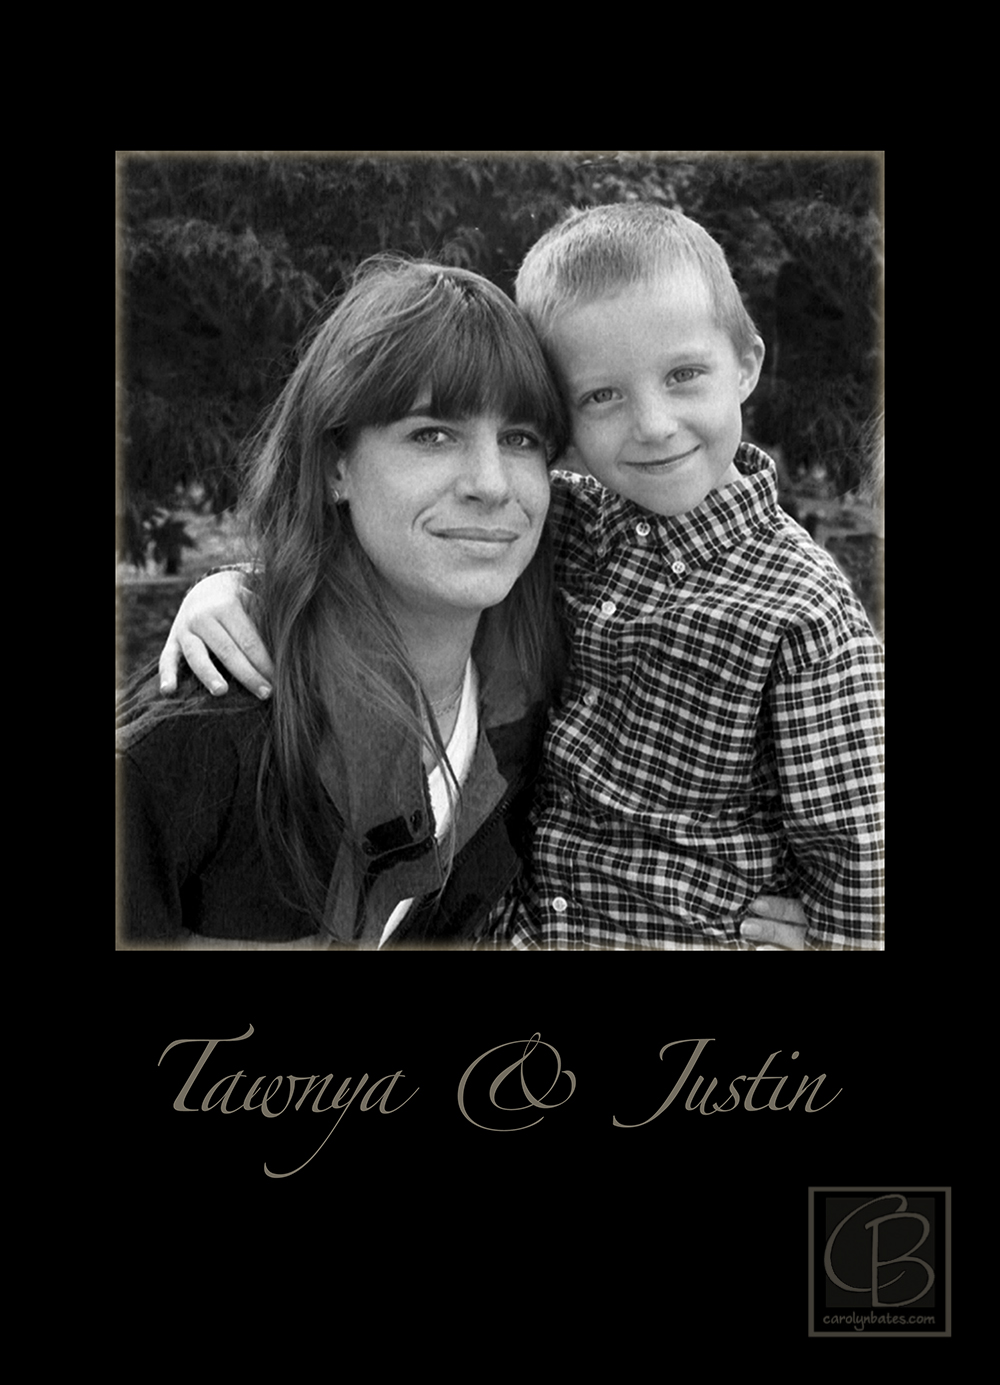 tawnya-justin-106 6a-web-srgb-c